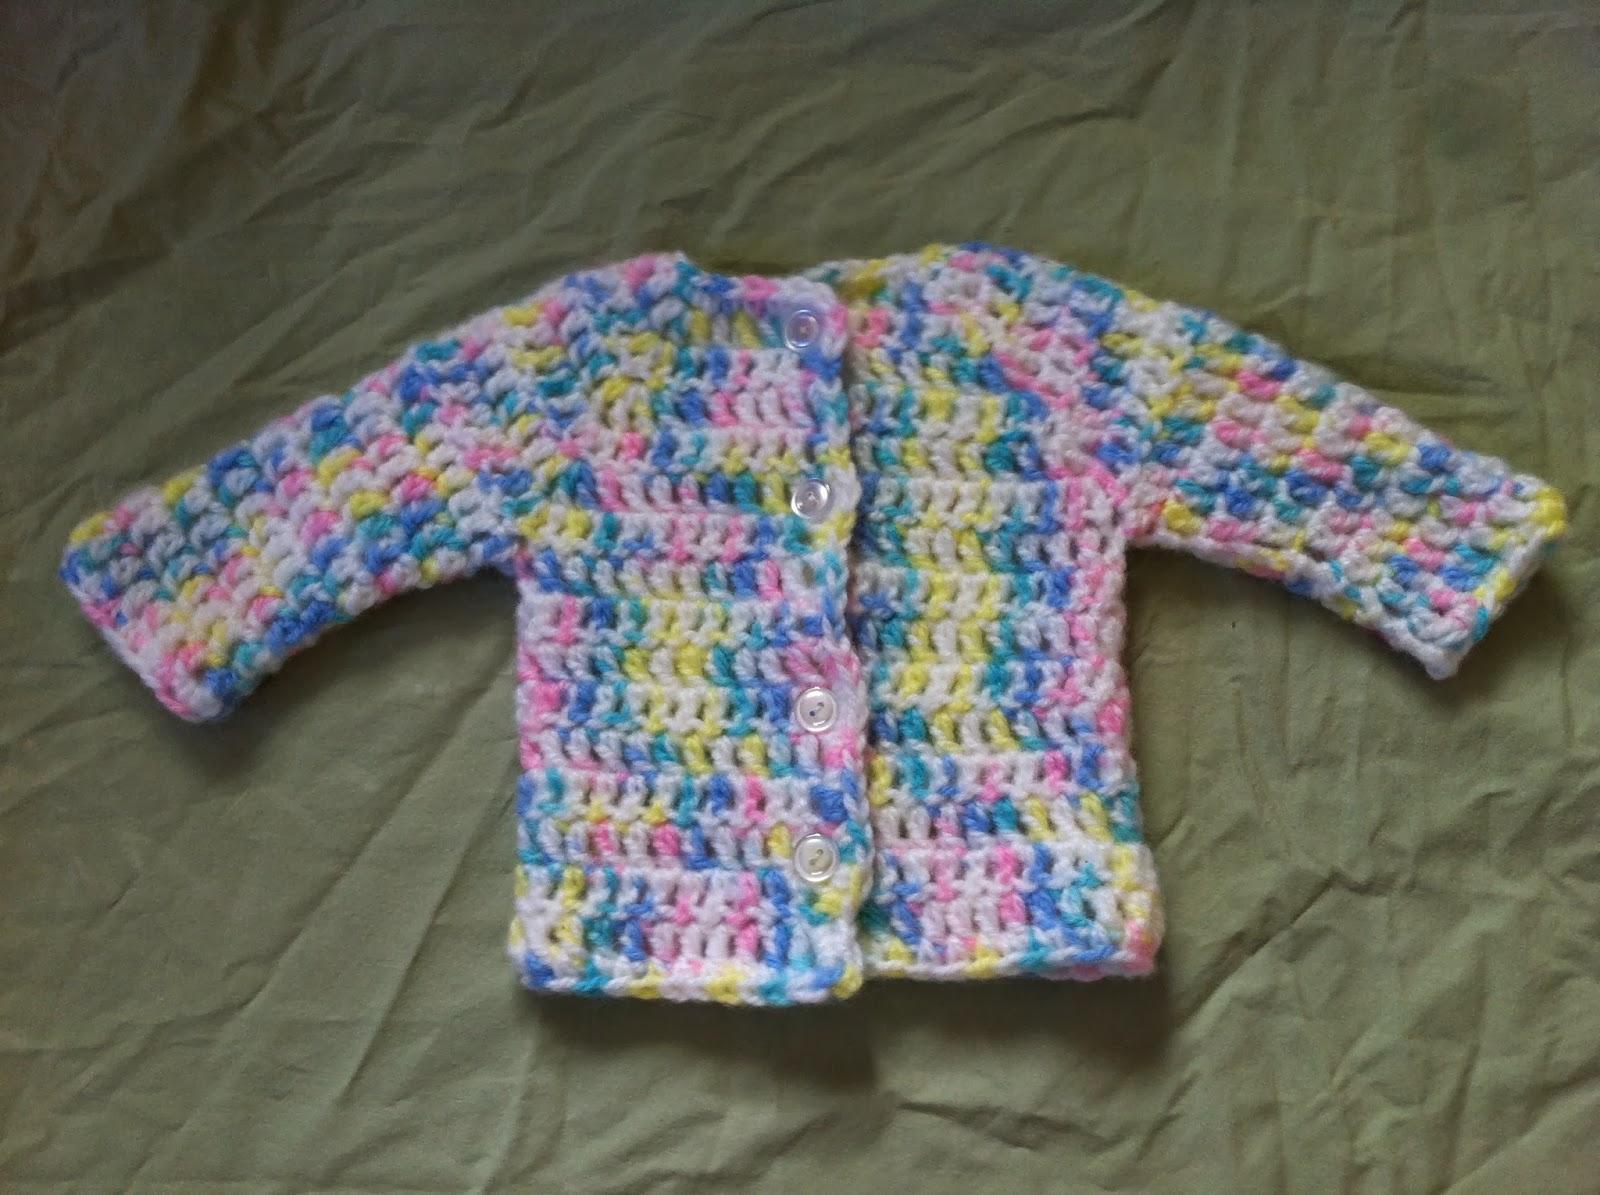 Free Crochet Pattern Preemie Sweater : Crochet Cardigan for Preemie / Newborn Babies - Free ...